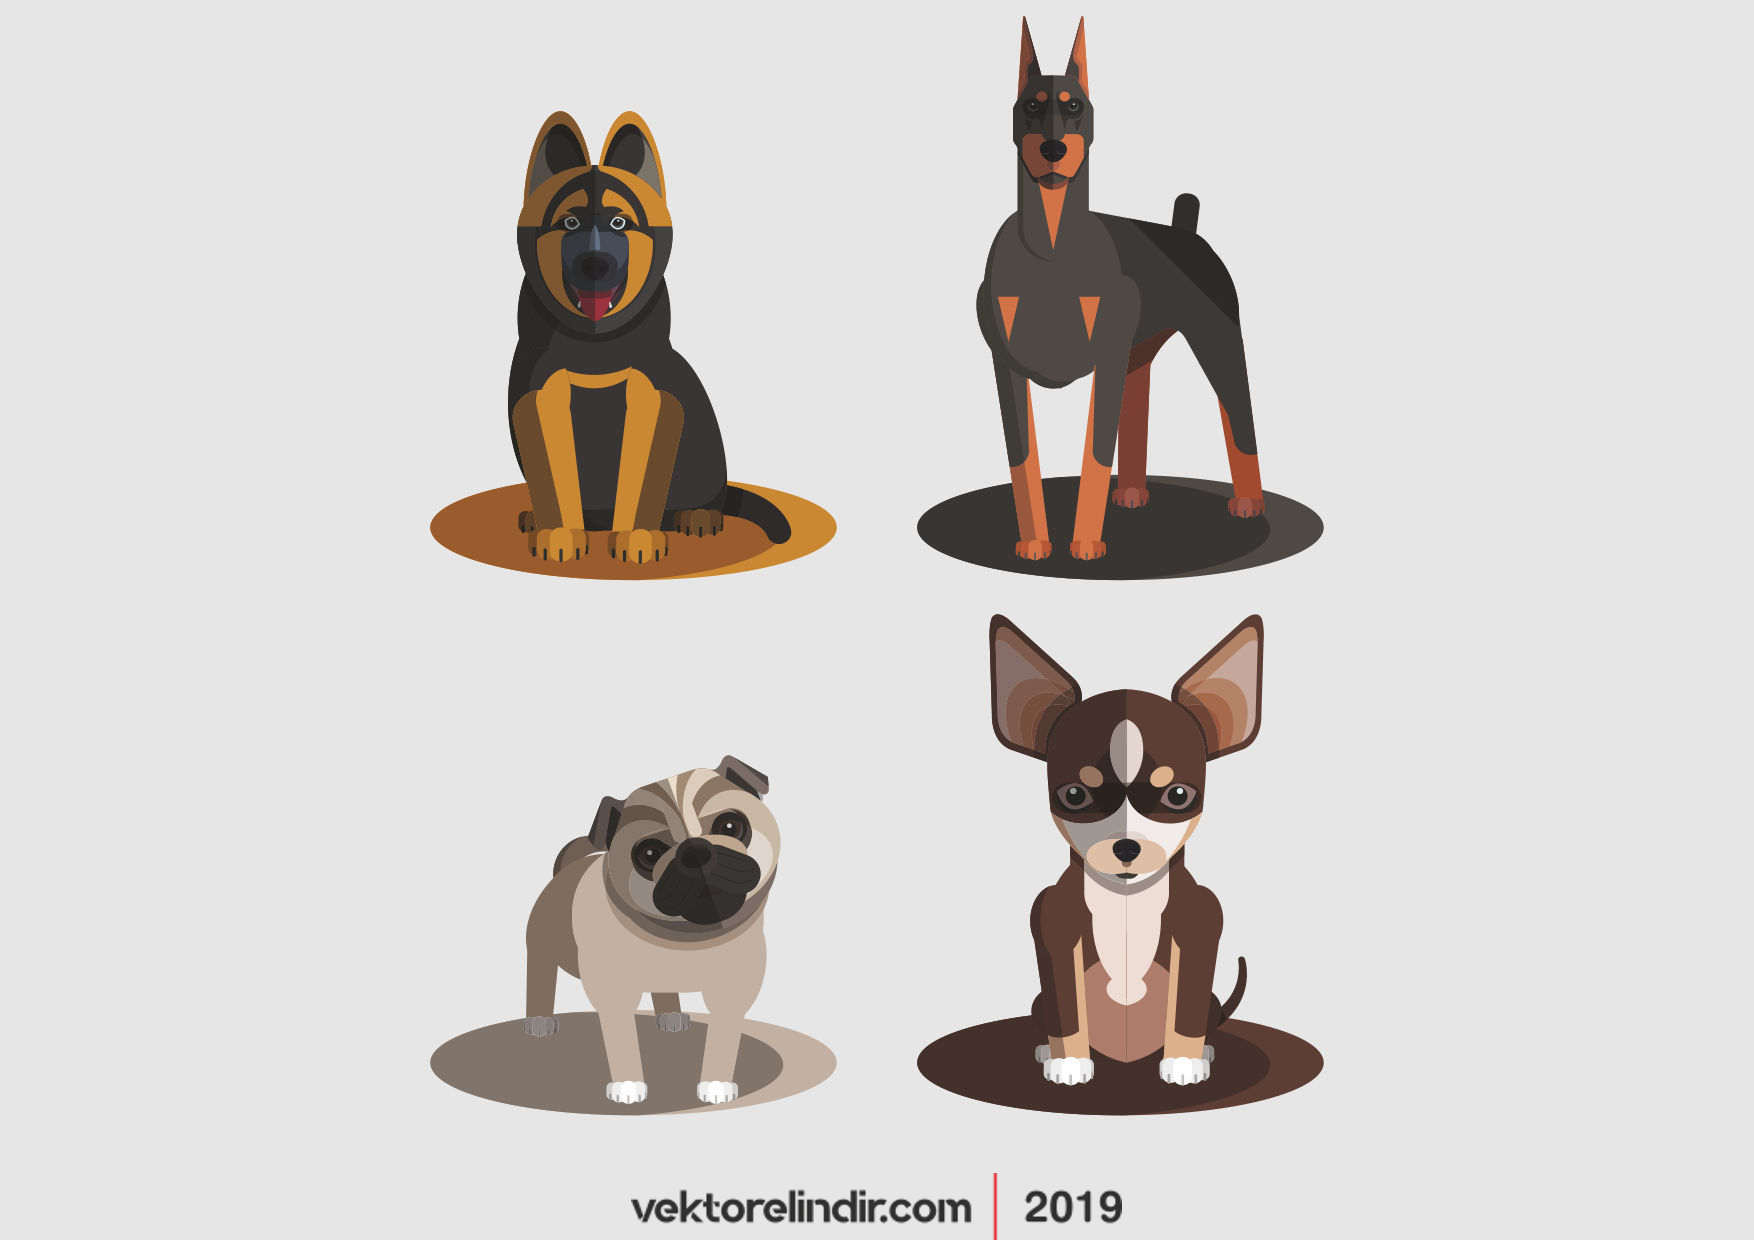 Köpek, Doberman, Vektör, Pitbull